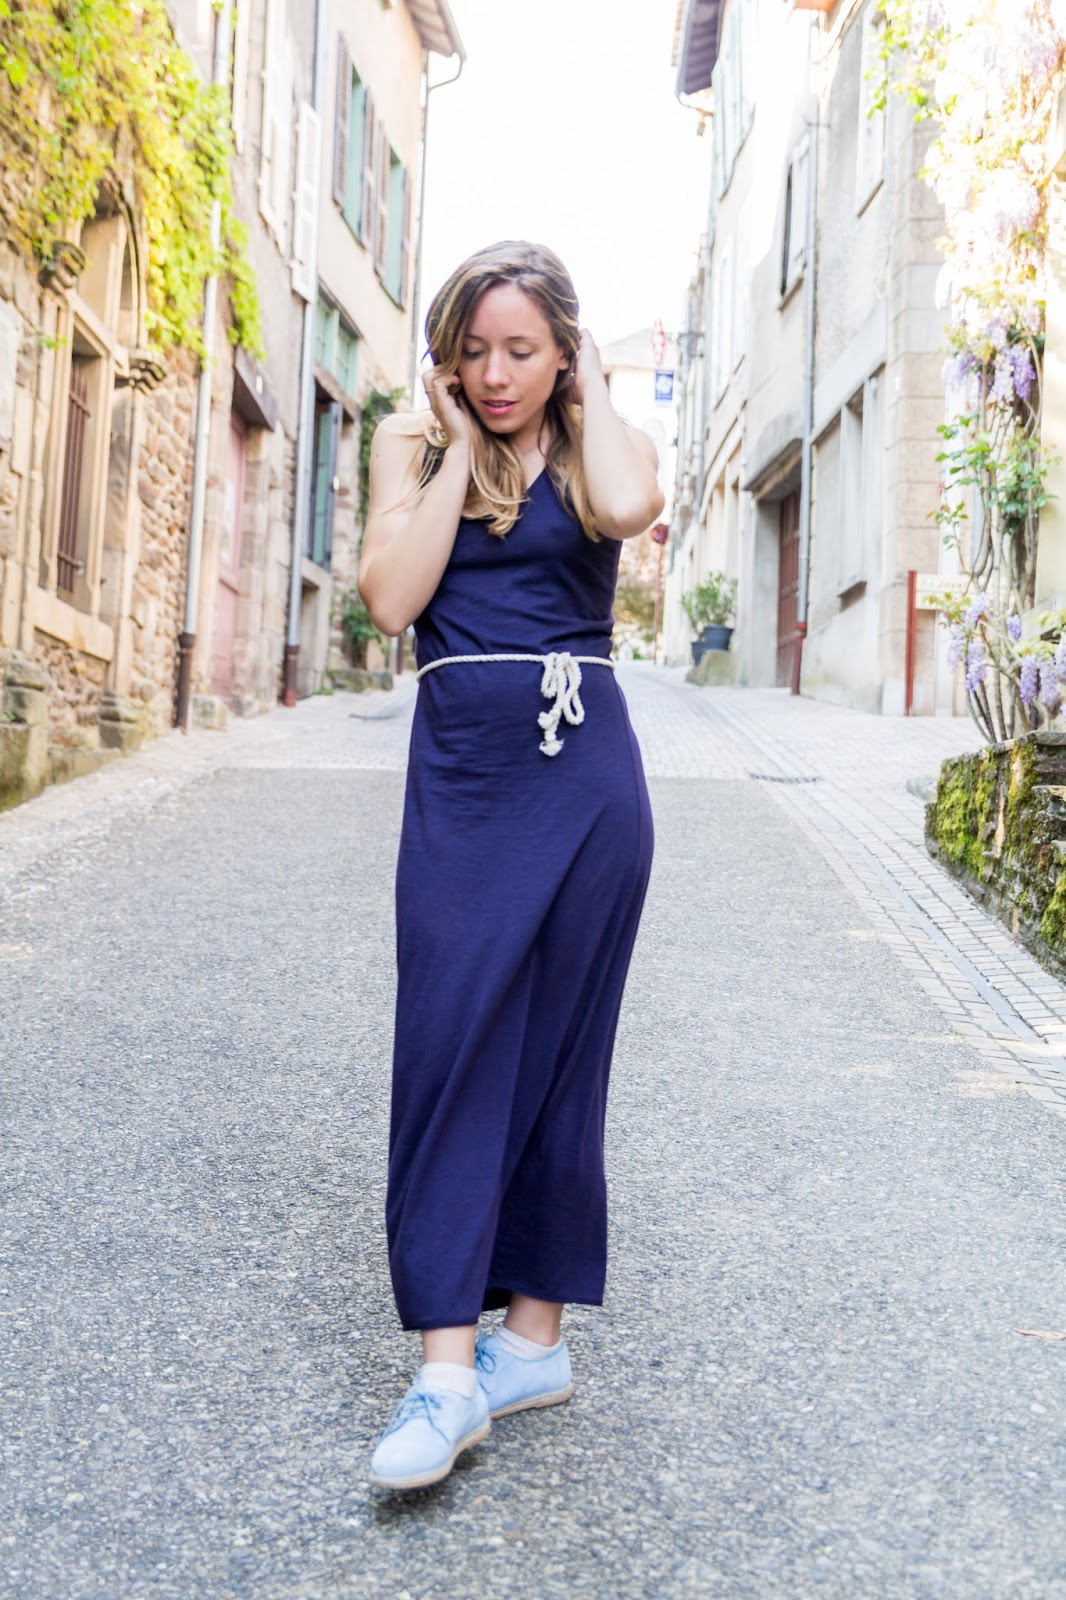 robe longue bleu marine blog mode la penderie de chloe. Black Bedroom Furniture Sets. Home Design Ideas